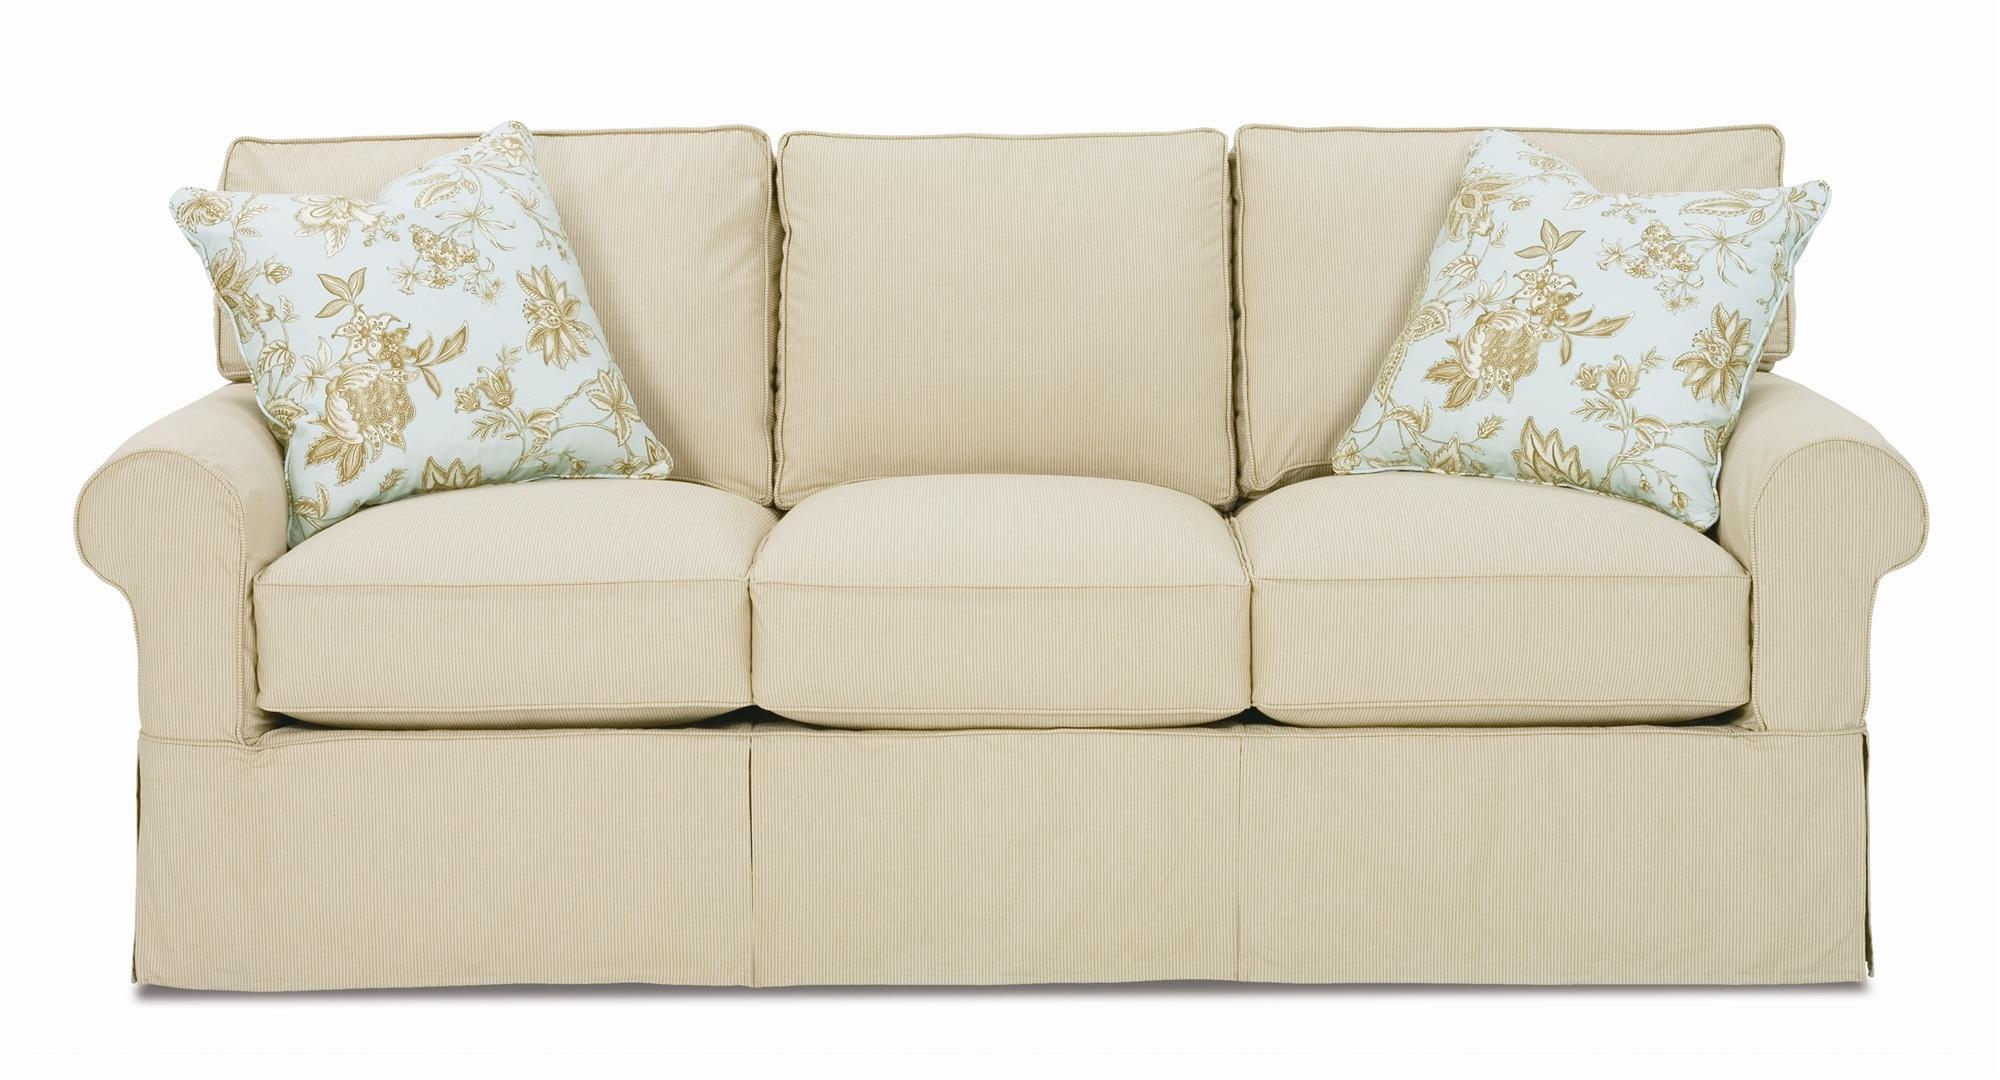 sofa slipcovers three cushions miami 20 best for 3 cushion sofas ideas